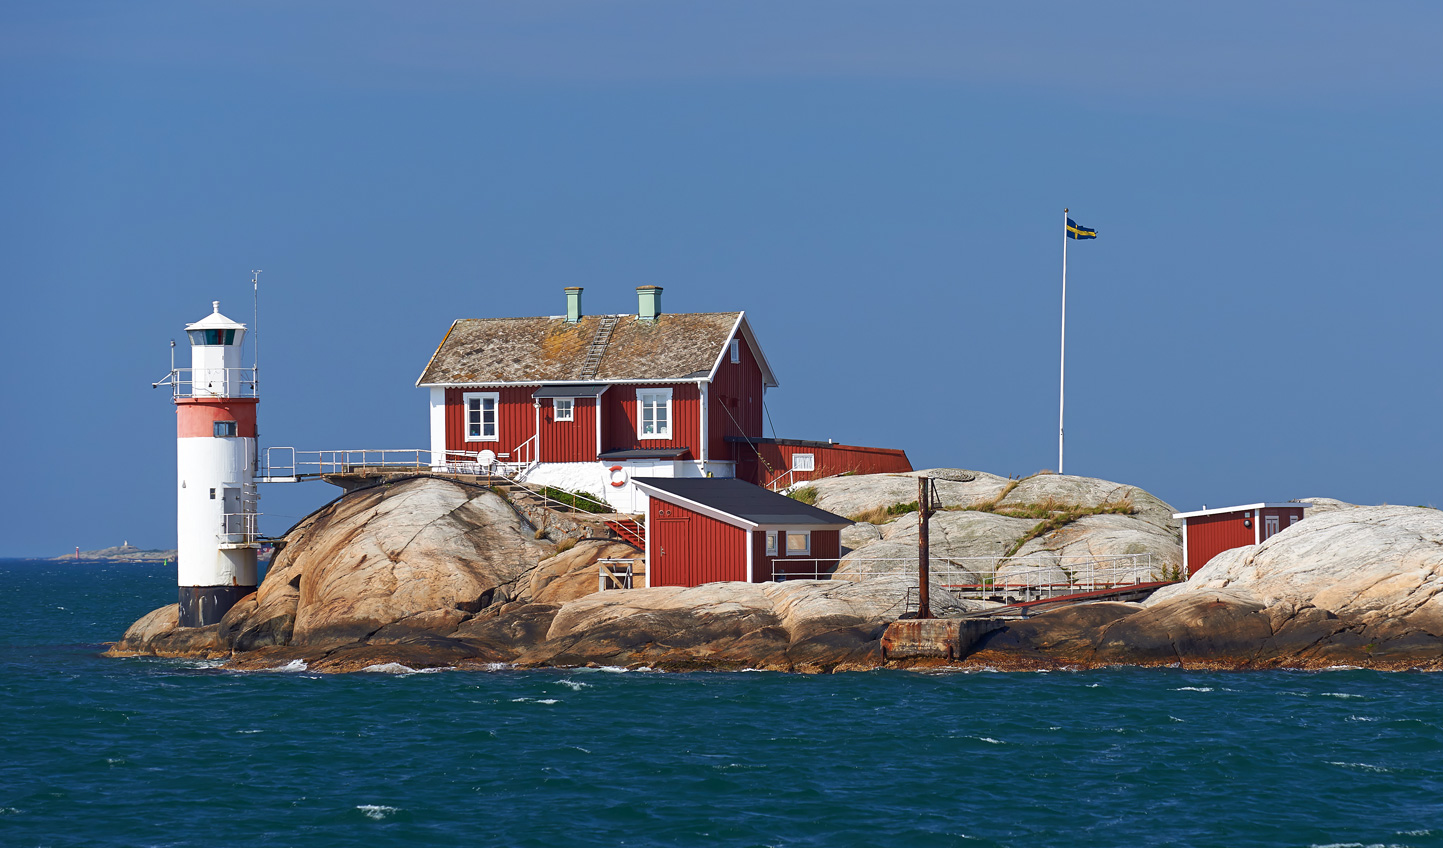 Archipelago_204214168